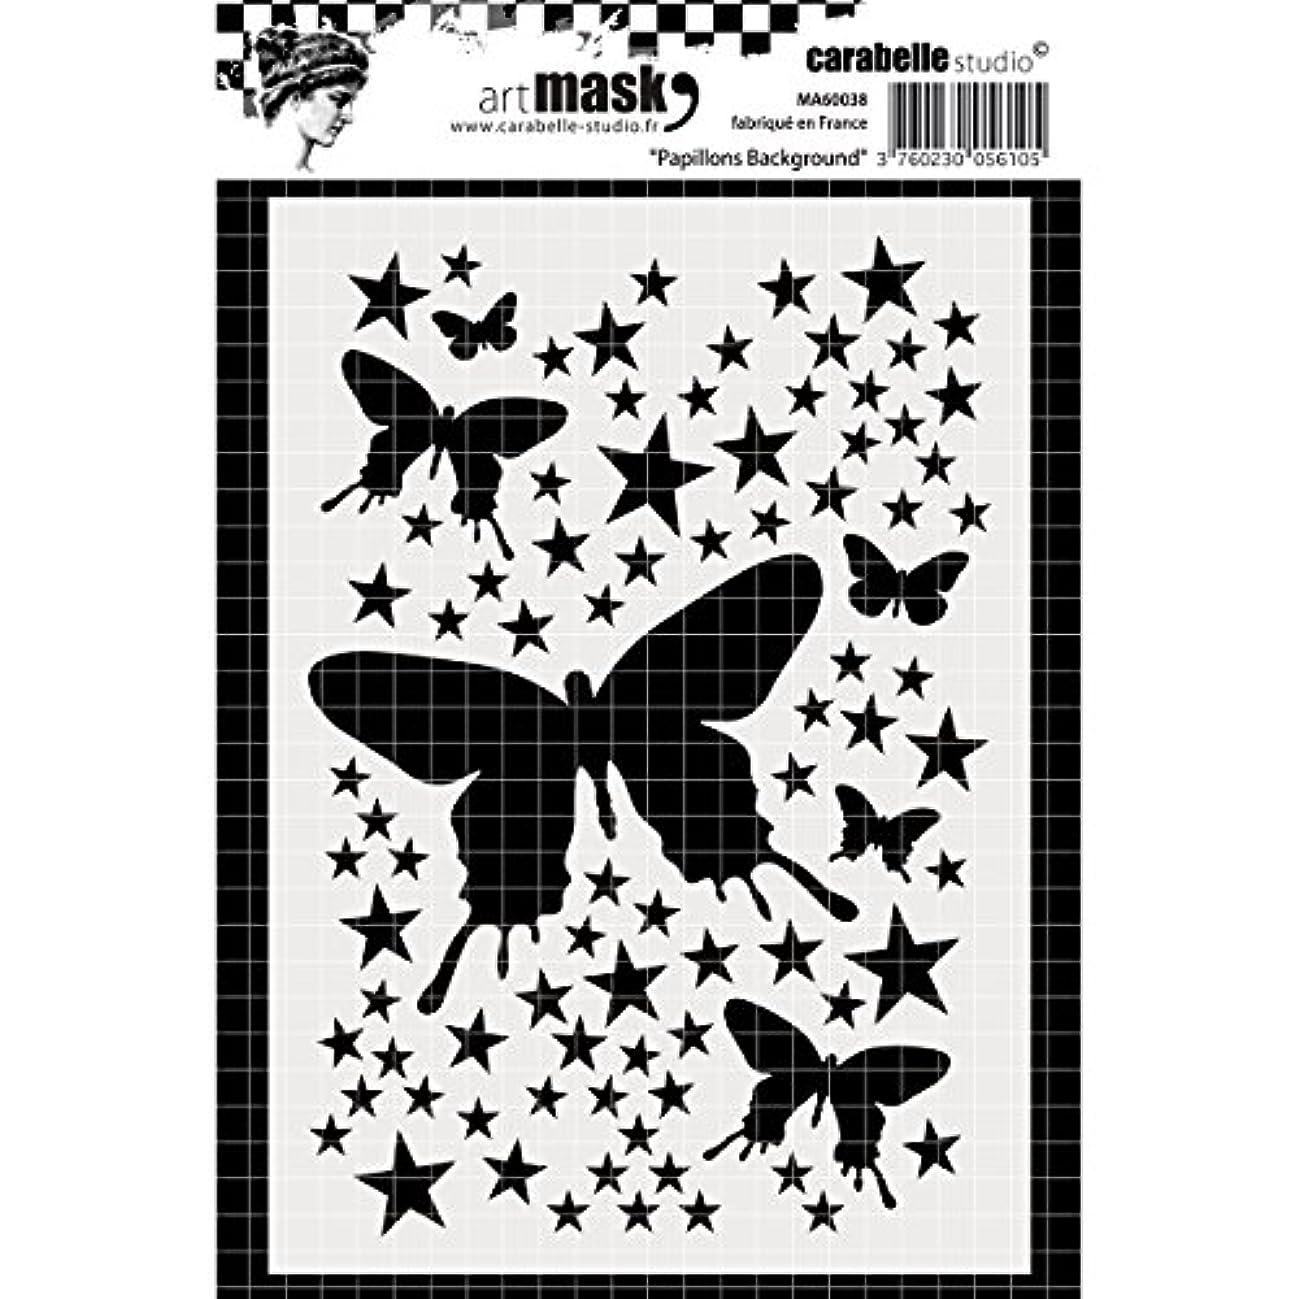 Carabelle Studio A6 Mask Stencil-Butterflies Background, White/Transparent